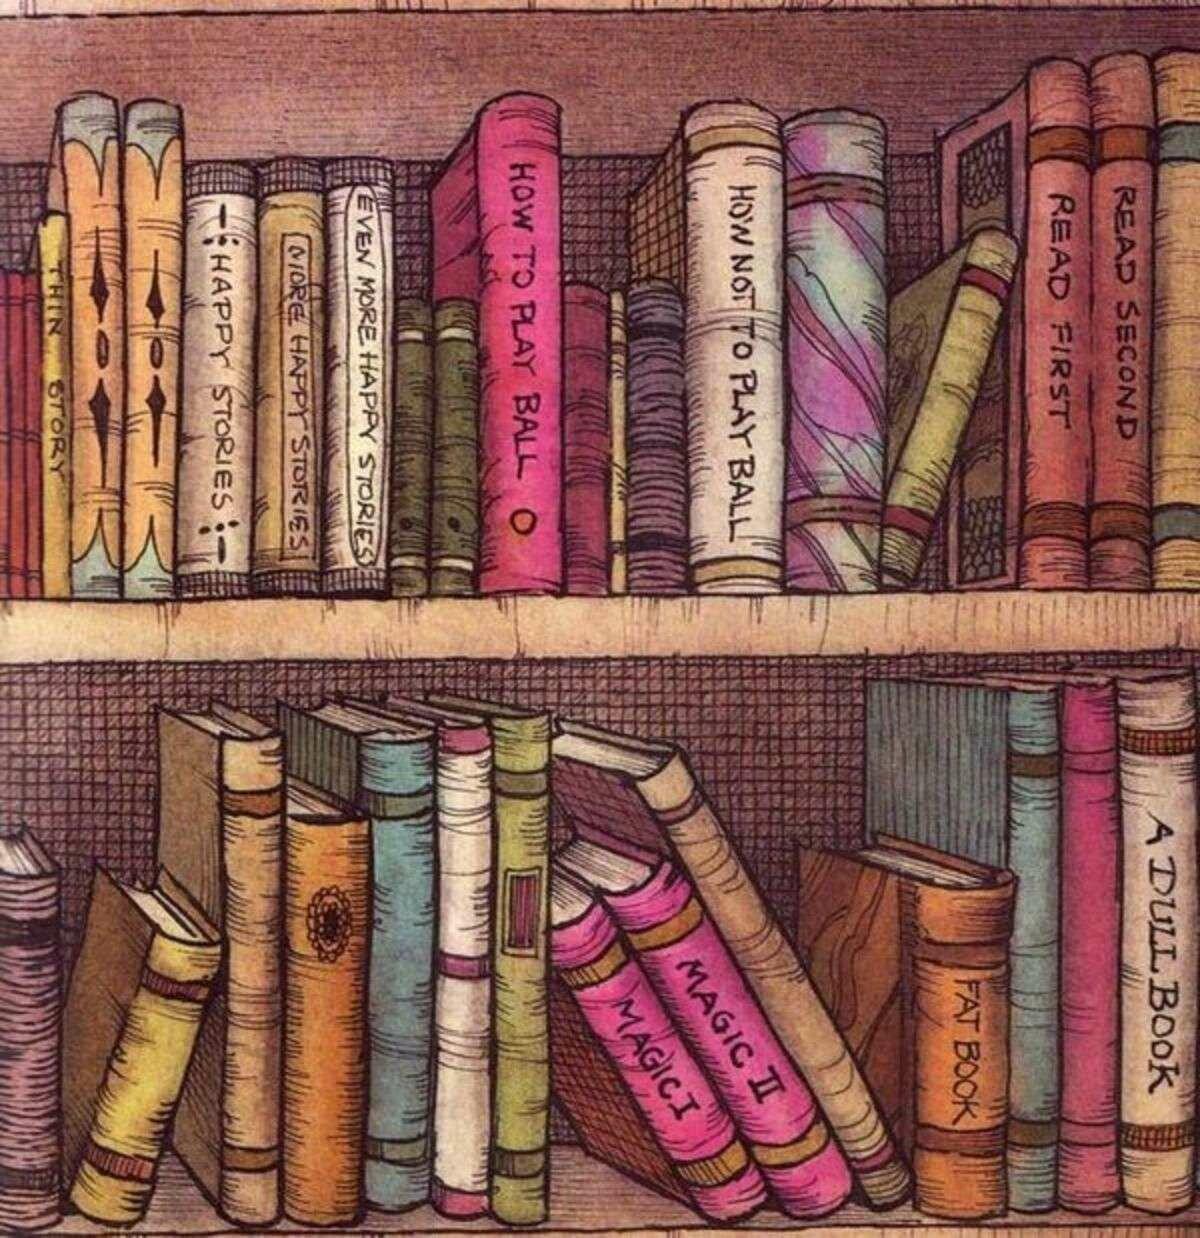 картинки с книжками и карандашами результате такого полуоборота